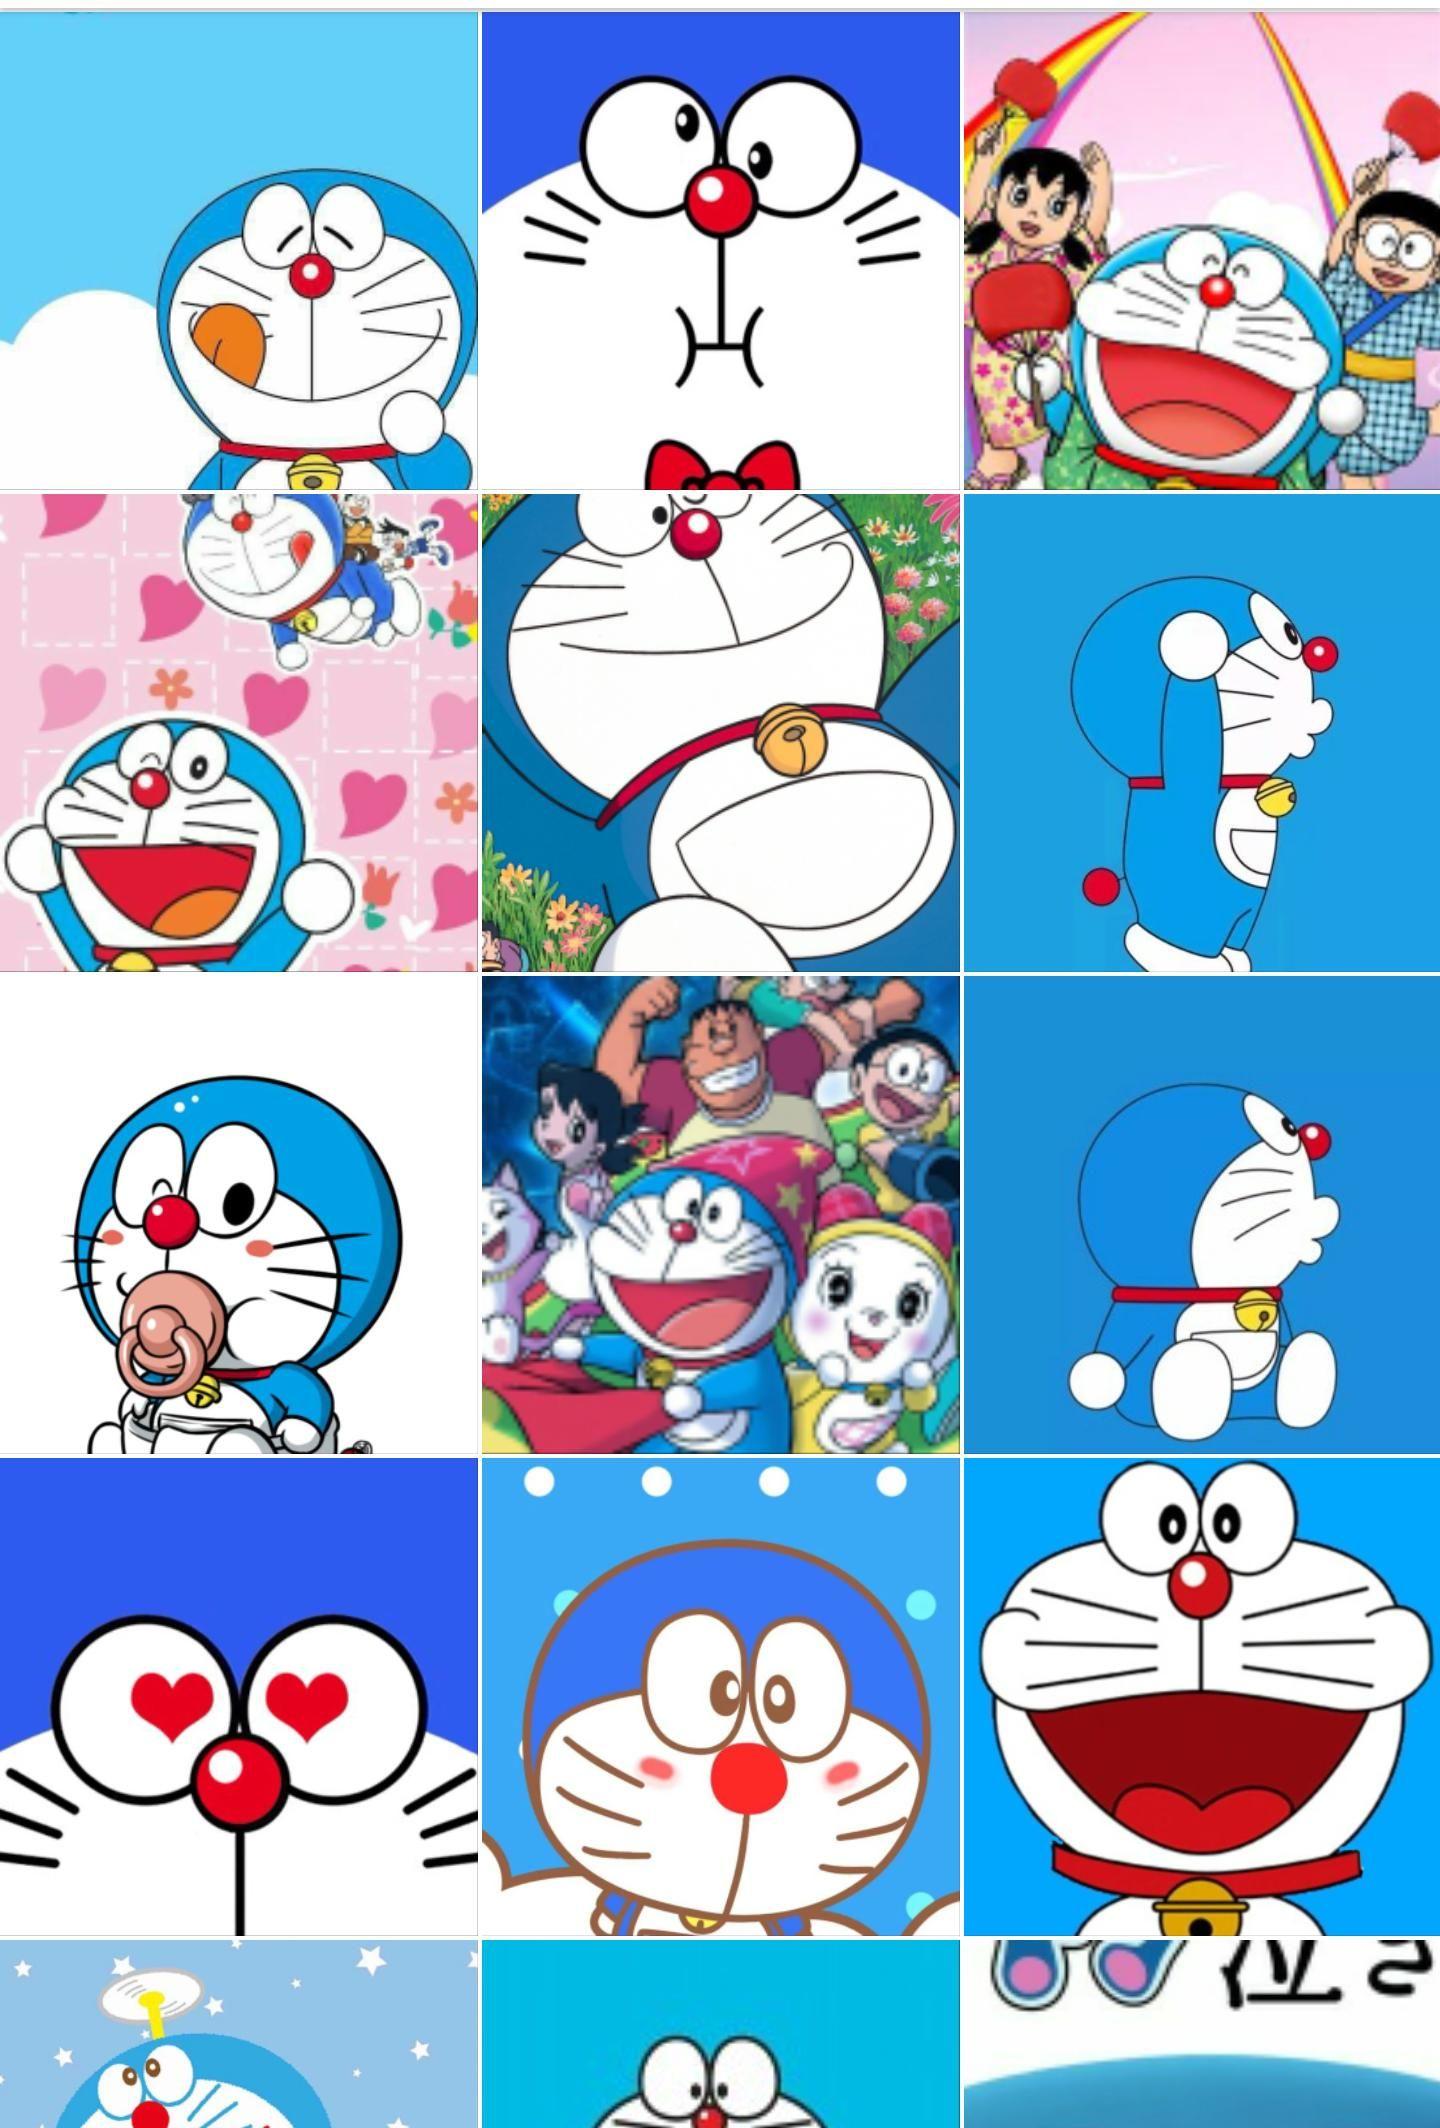 29 Wallpaper Hp Doraemon Rona Wallpaper Doraemon Wallpapers Cute Cartoon Wallpapers Cartoon Wallpaper 29 full hd wallpaper hd